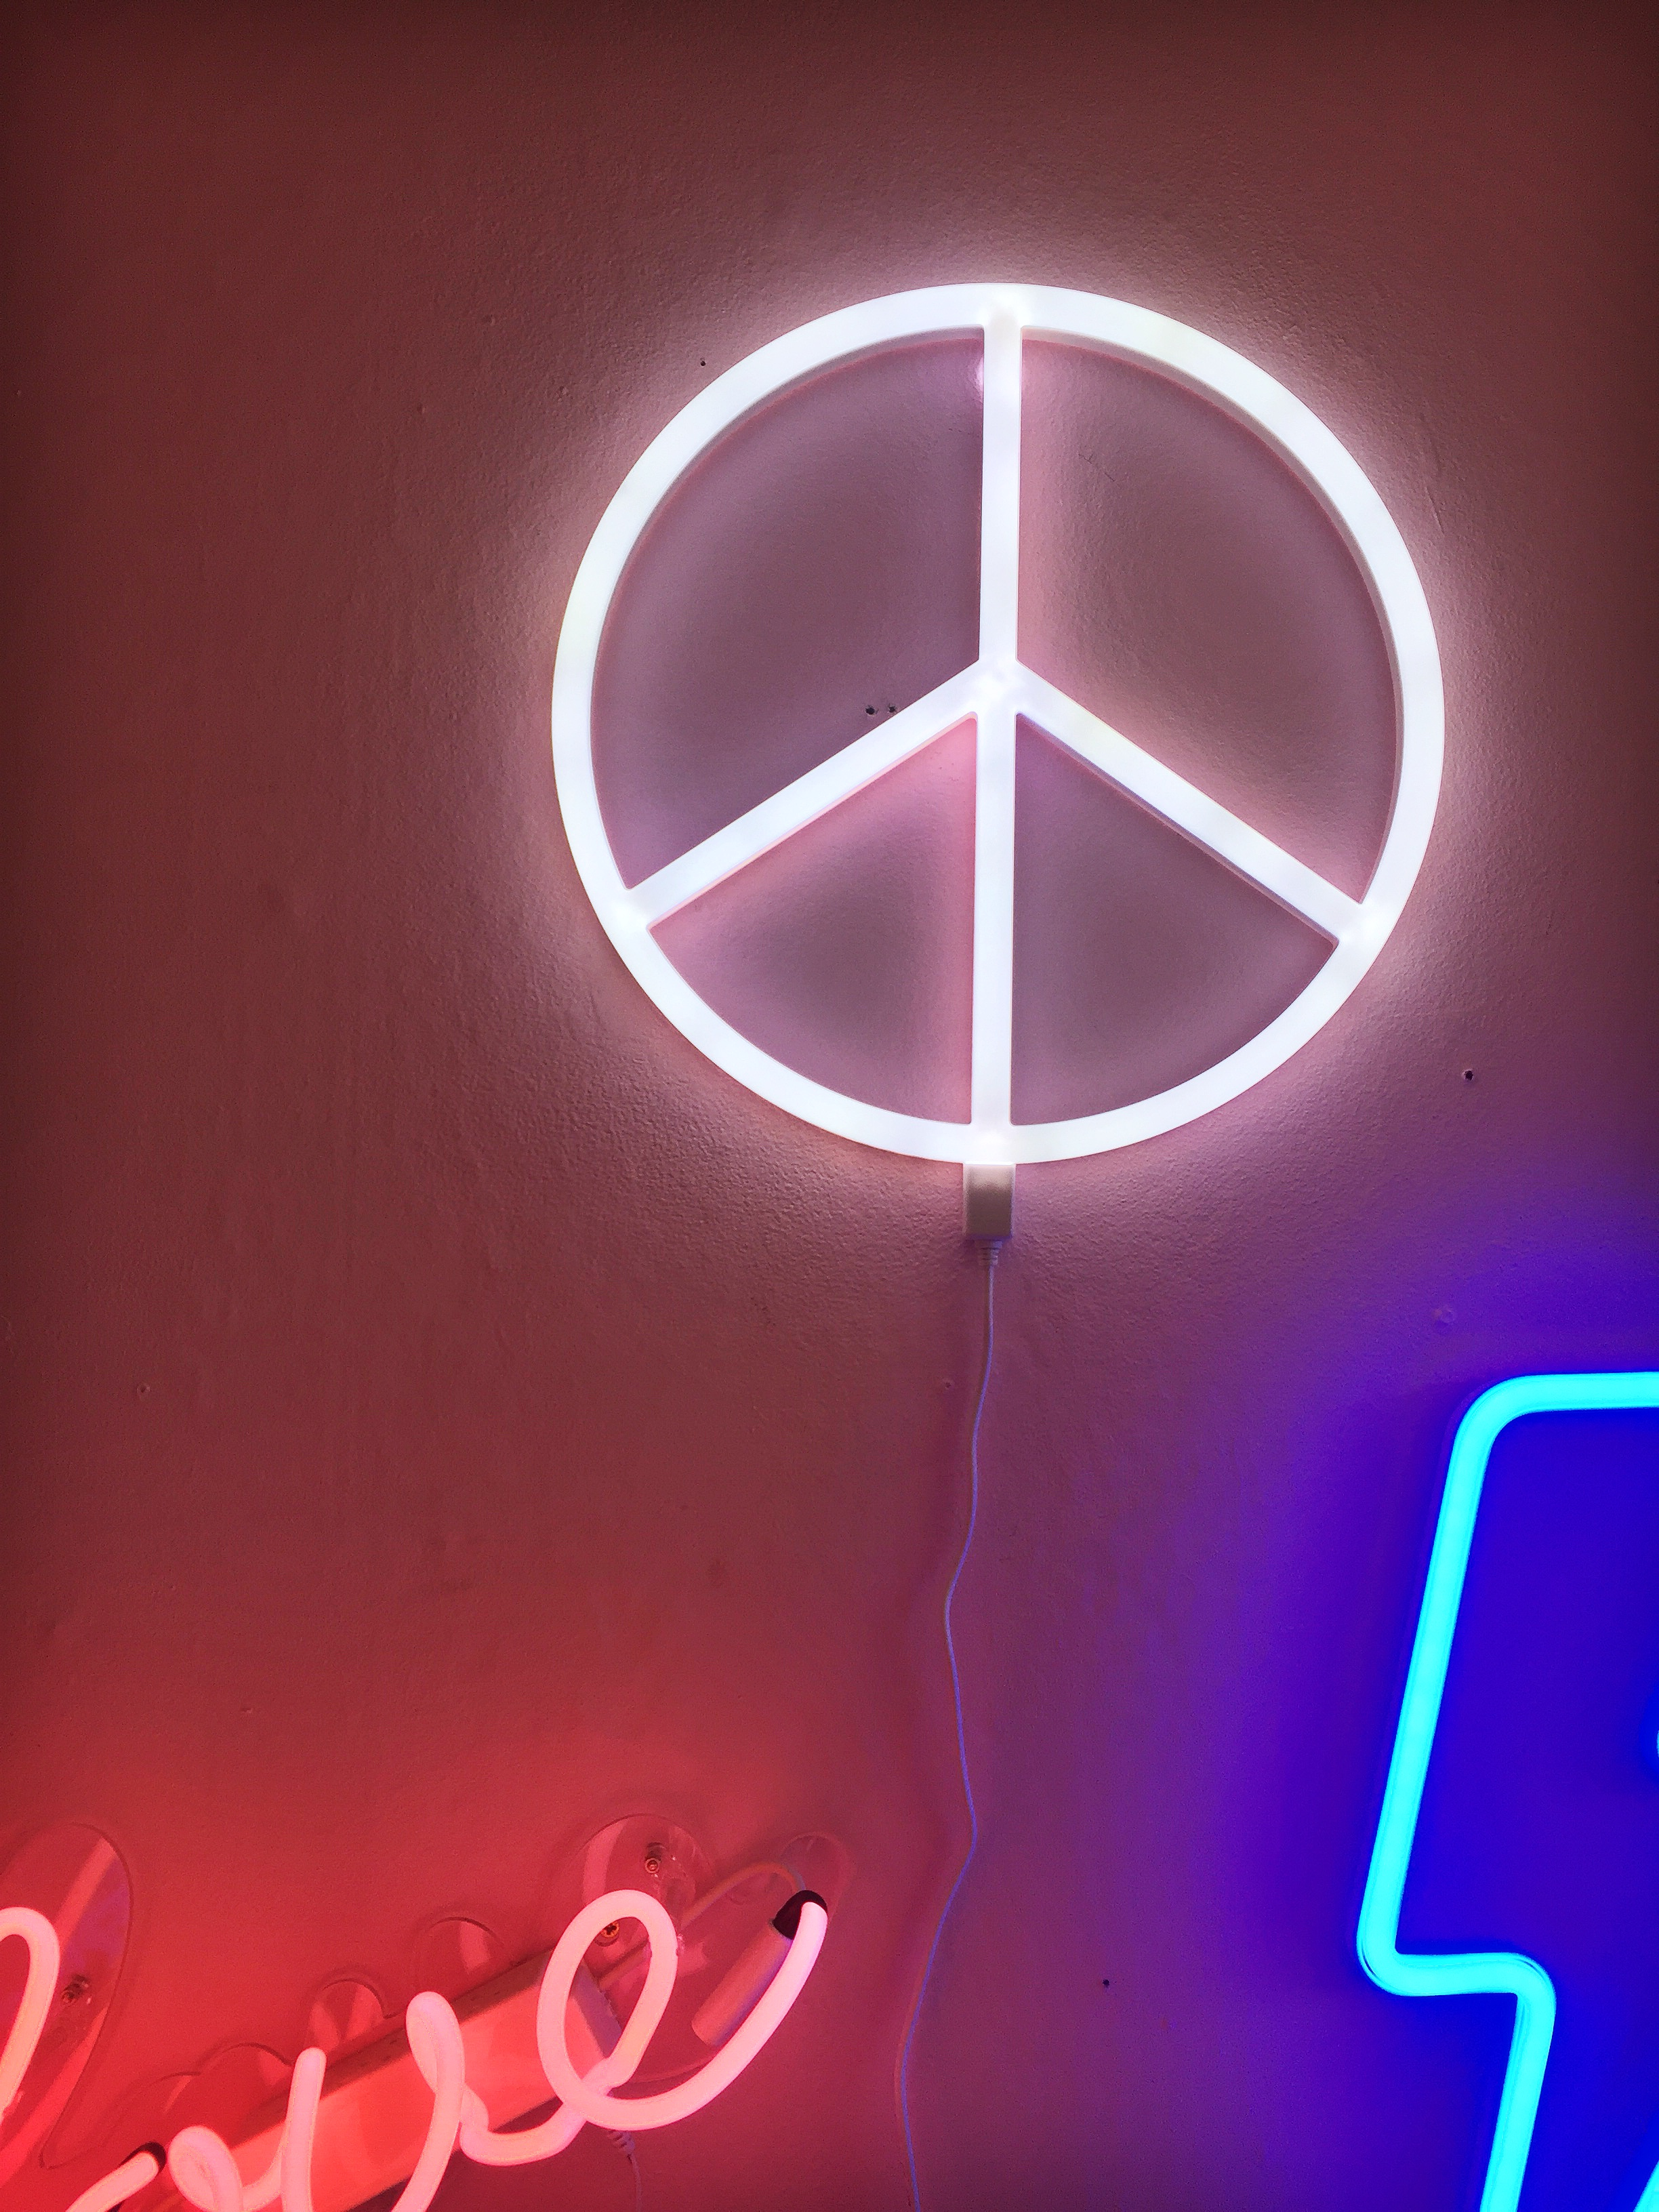 A Little Lovely Company Peace L E D Neon Light